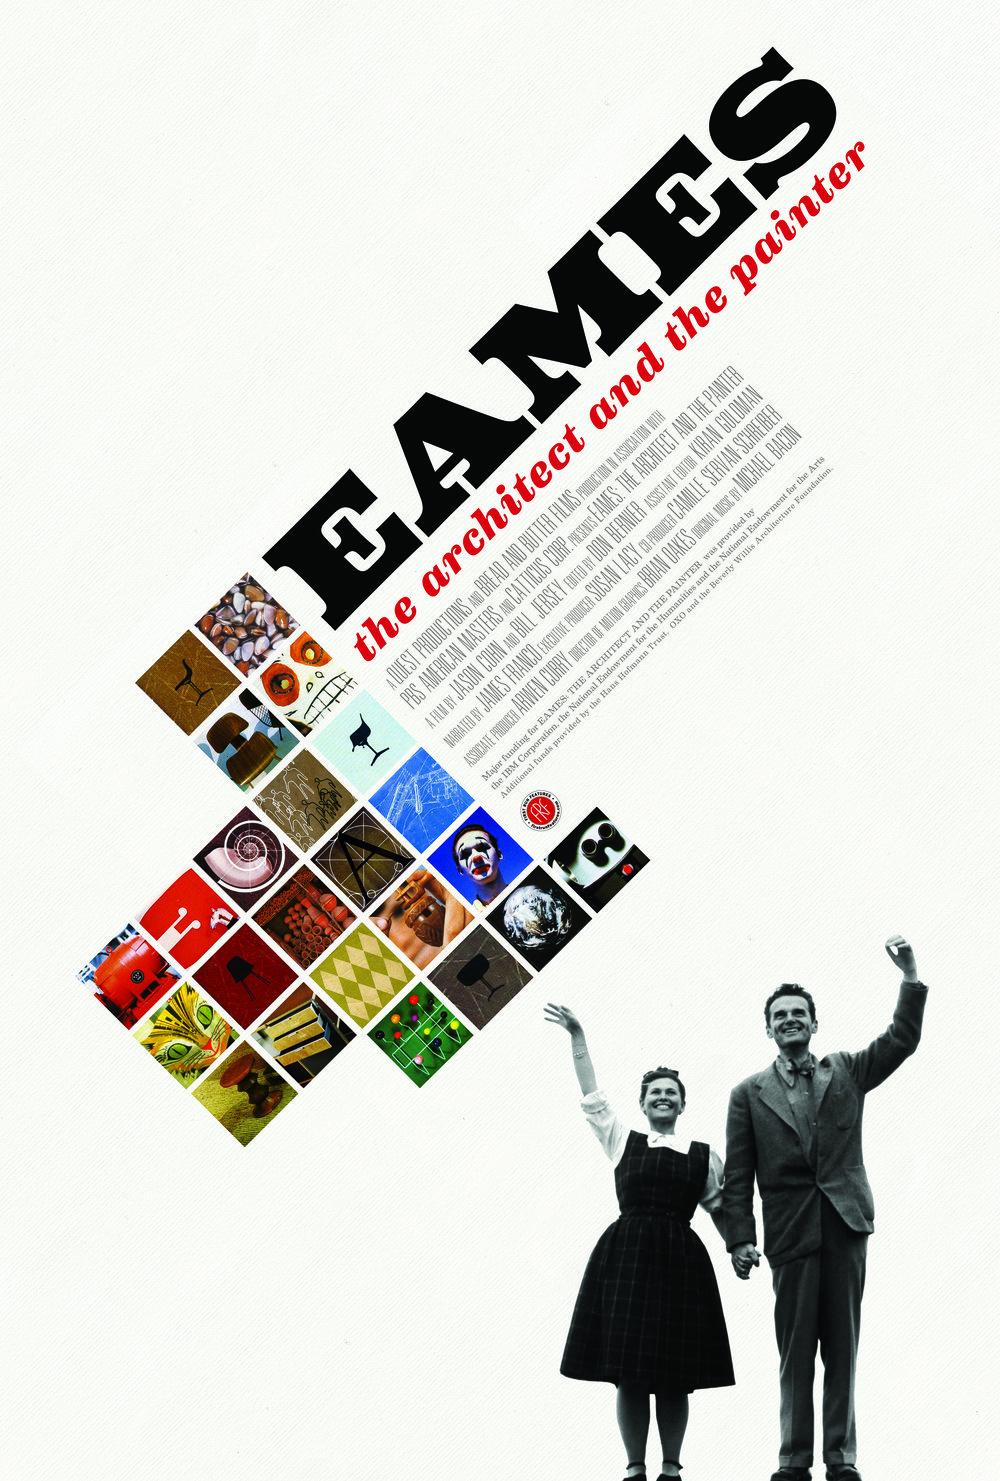 EAMES_poster_print_27x40.jpg